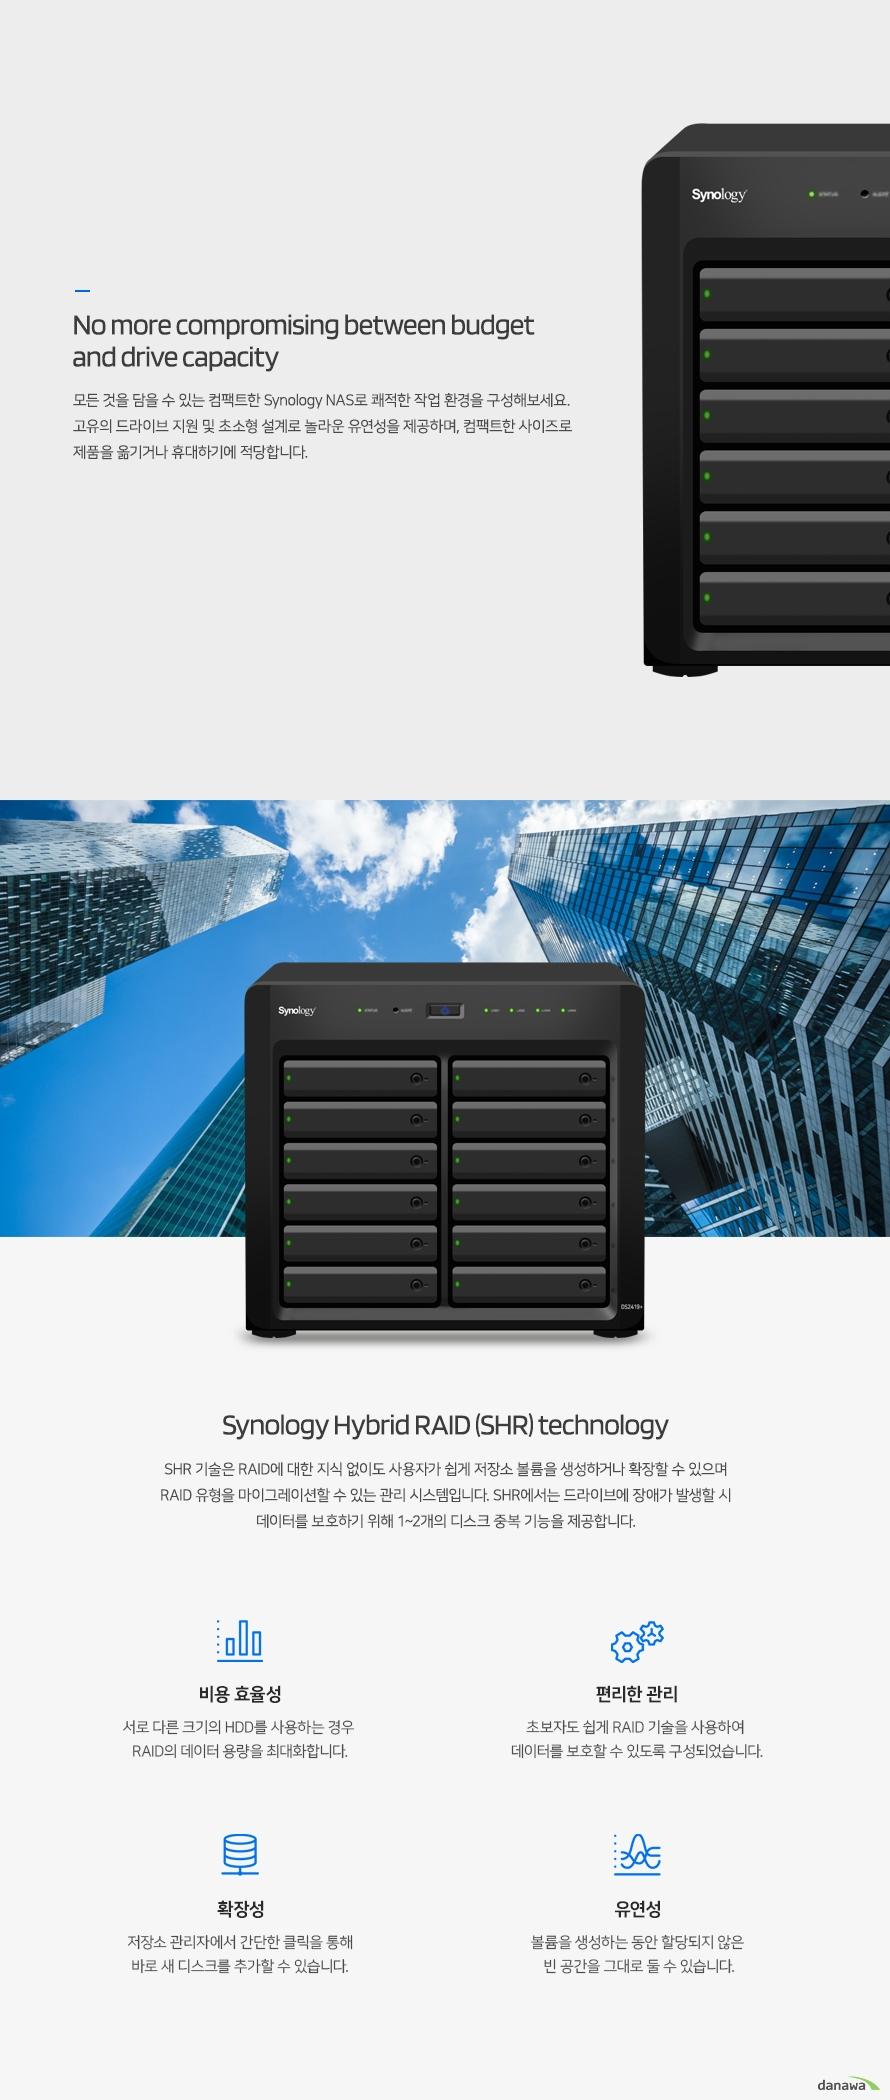 Synology DS2419+ RAM 4GB (120TB)